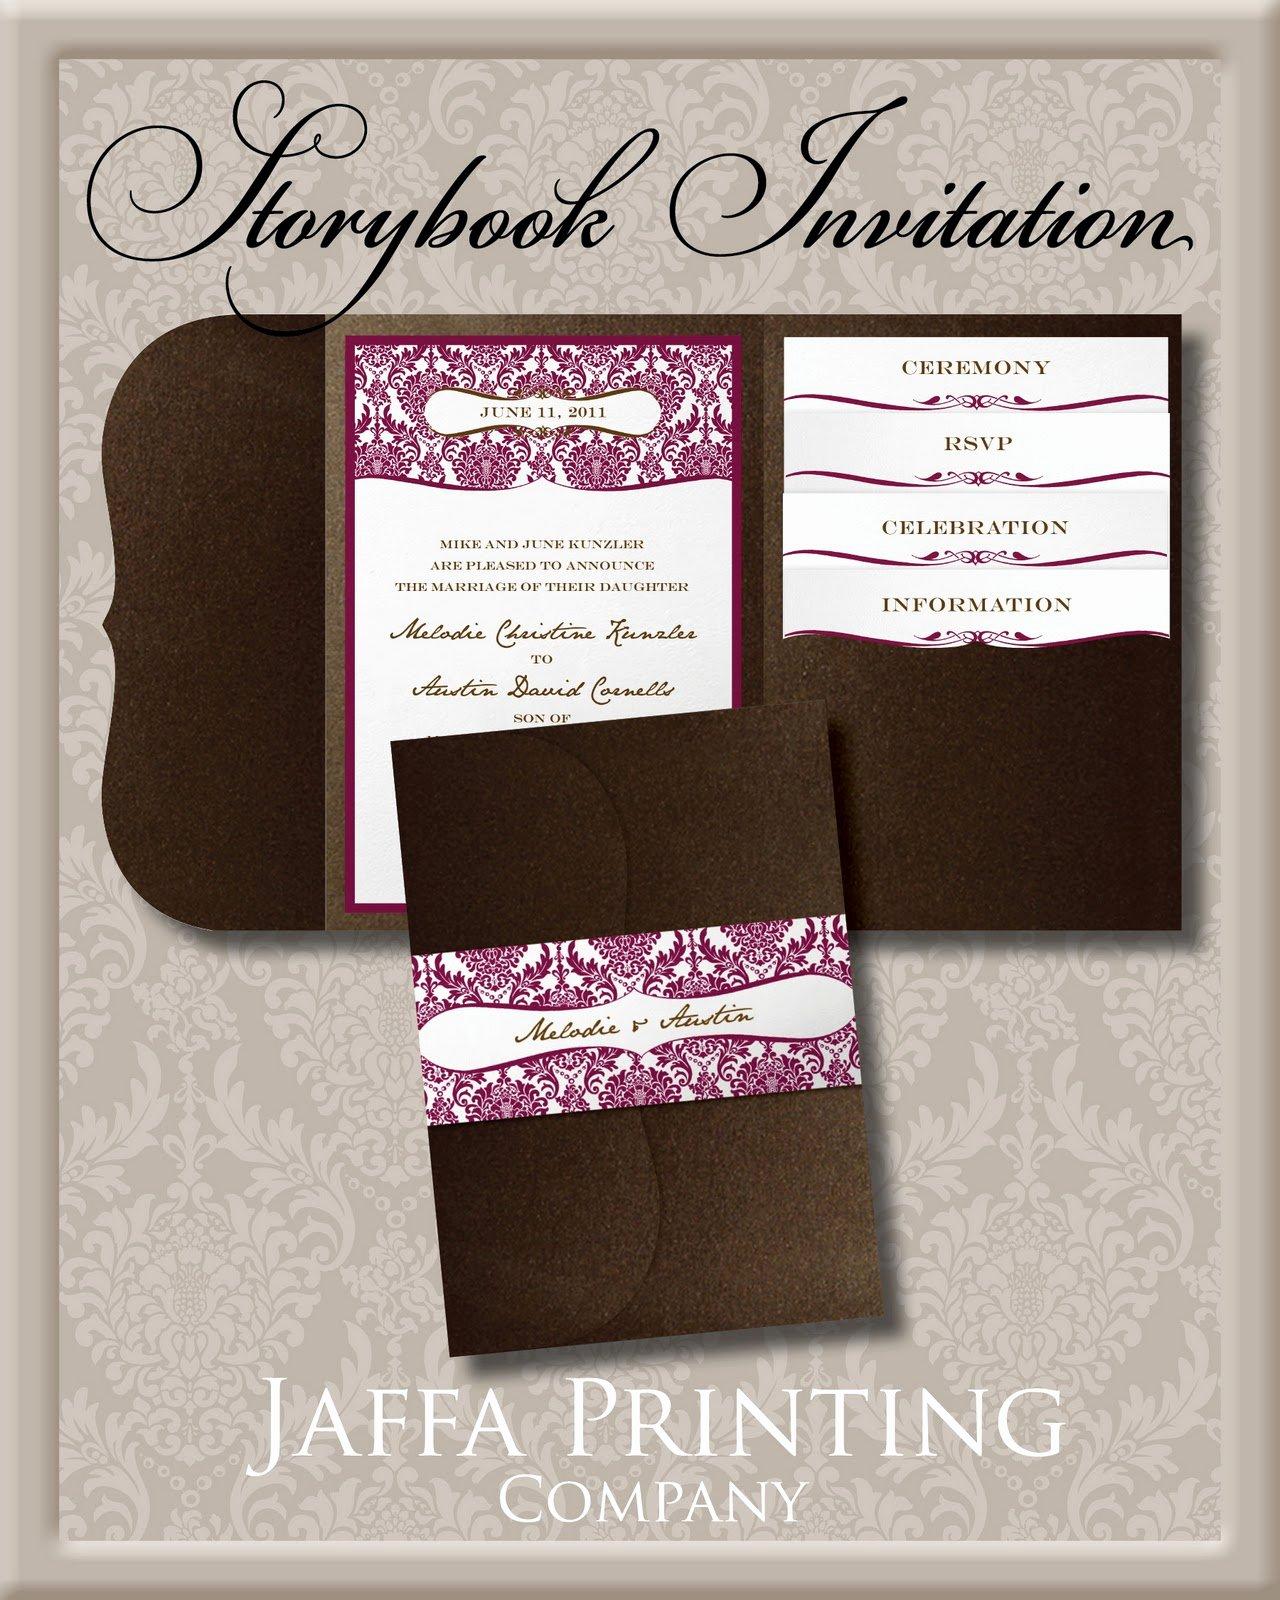 Pocket Wedding Invitation Template Inspirational Wedding Invitation Blog Pocket Invitation